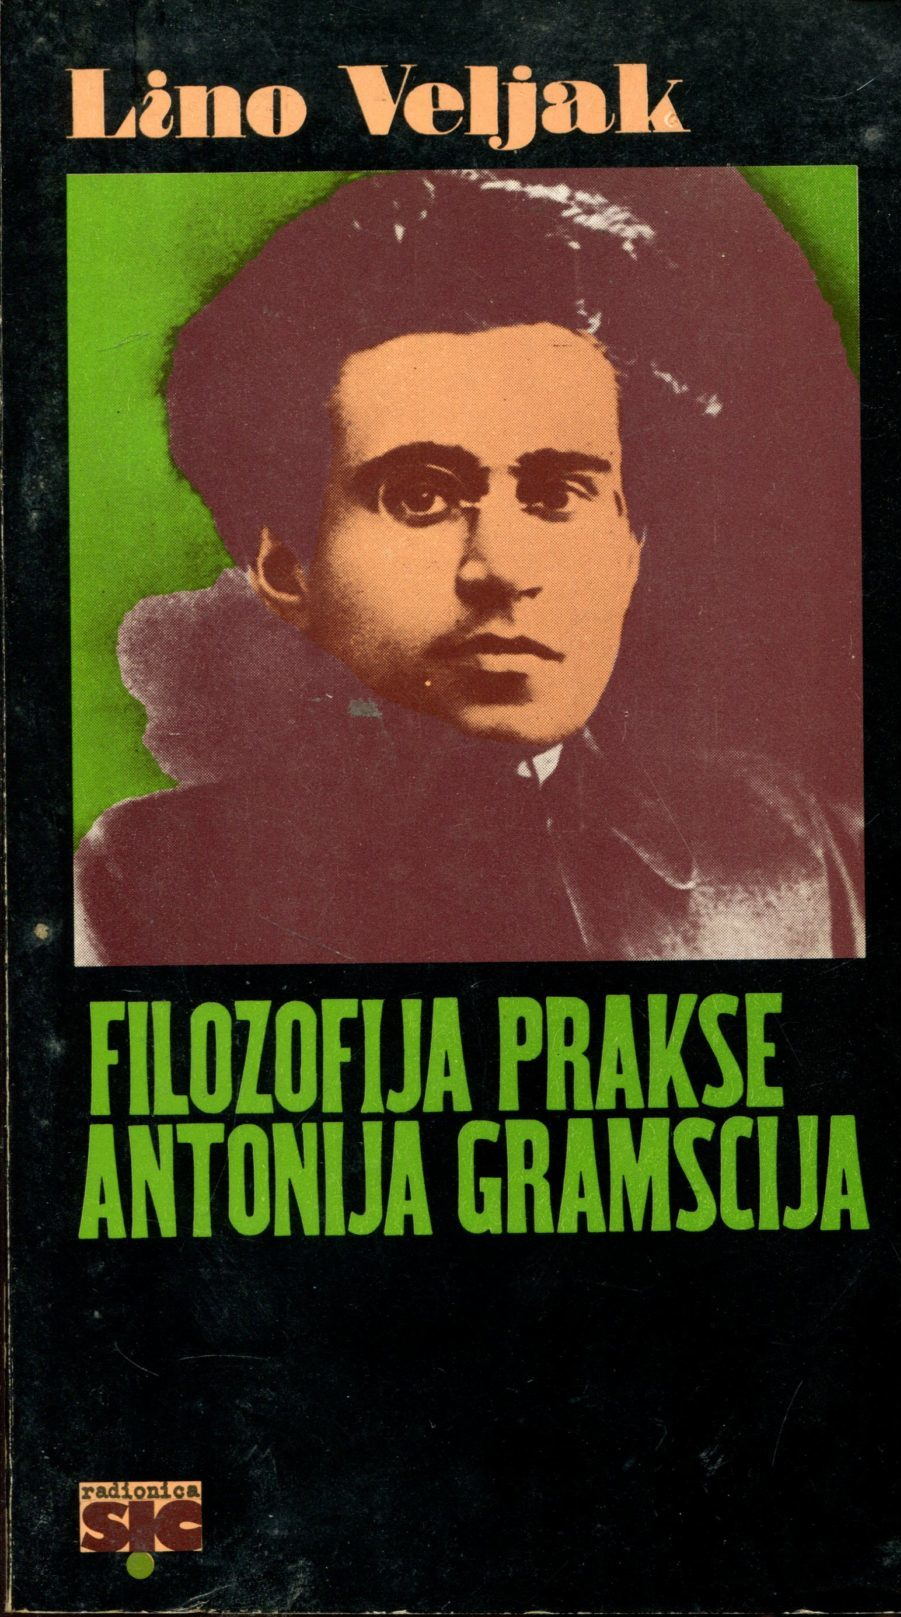 Filozofija prakse Antonija Gramscija Lino Veljak